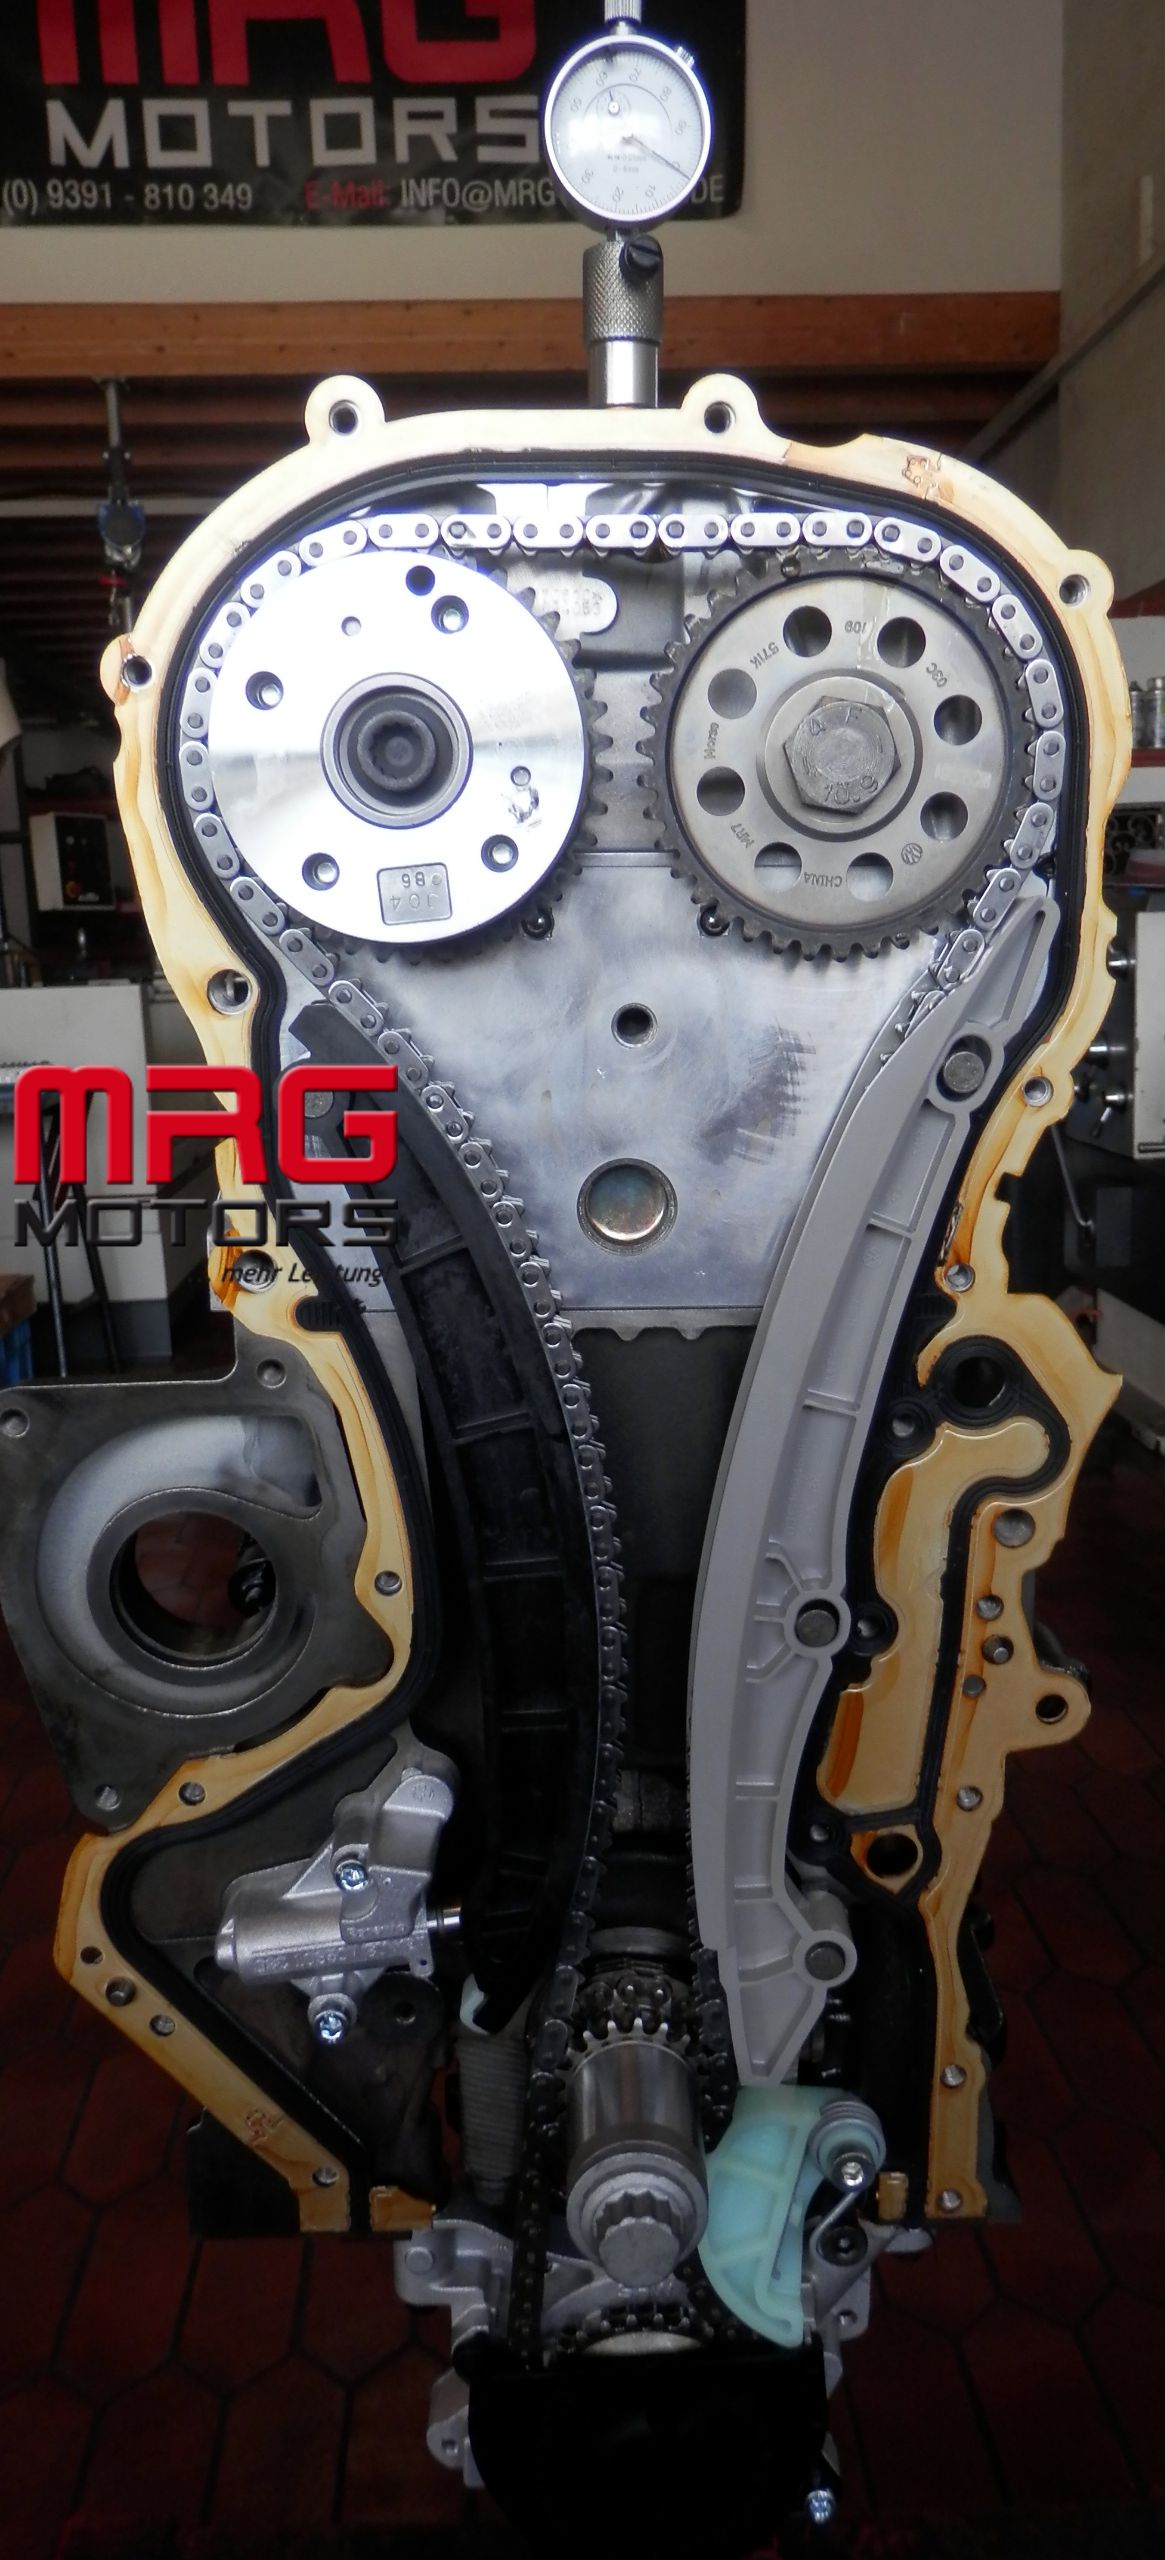 motor vw 1 4 tsi cavd general berholt mrg motors neue produkte